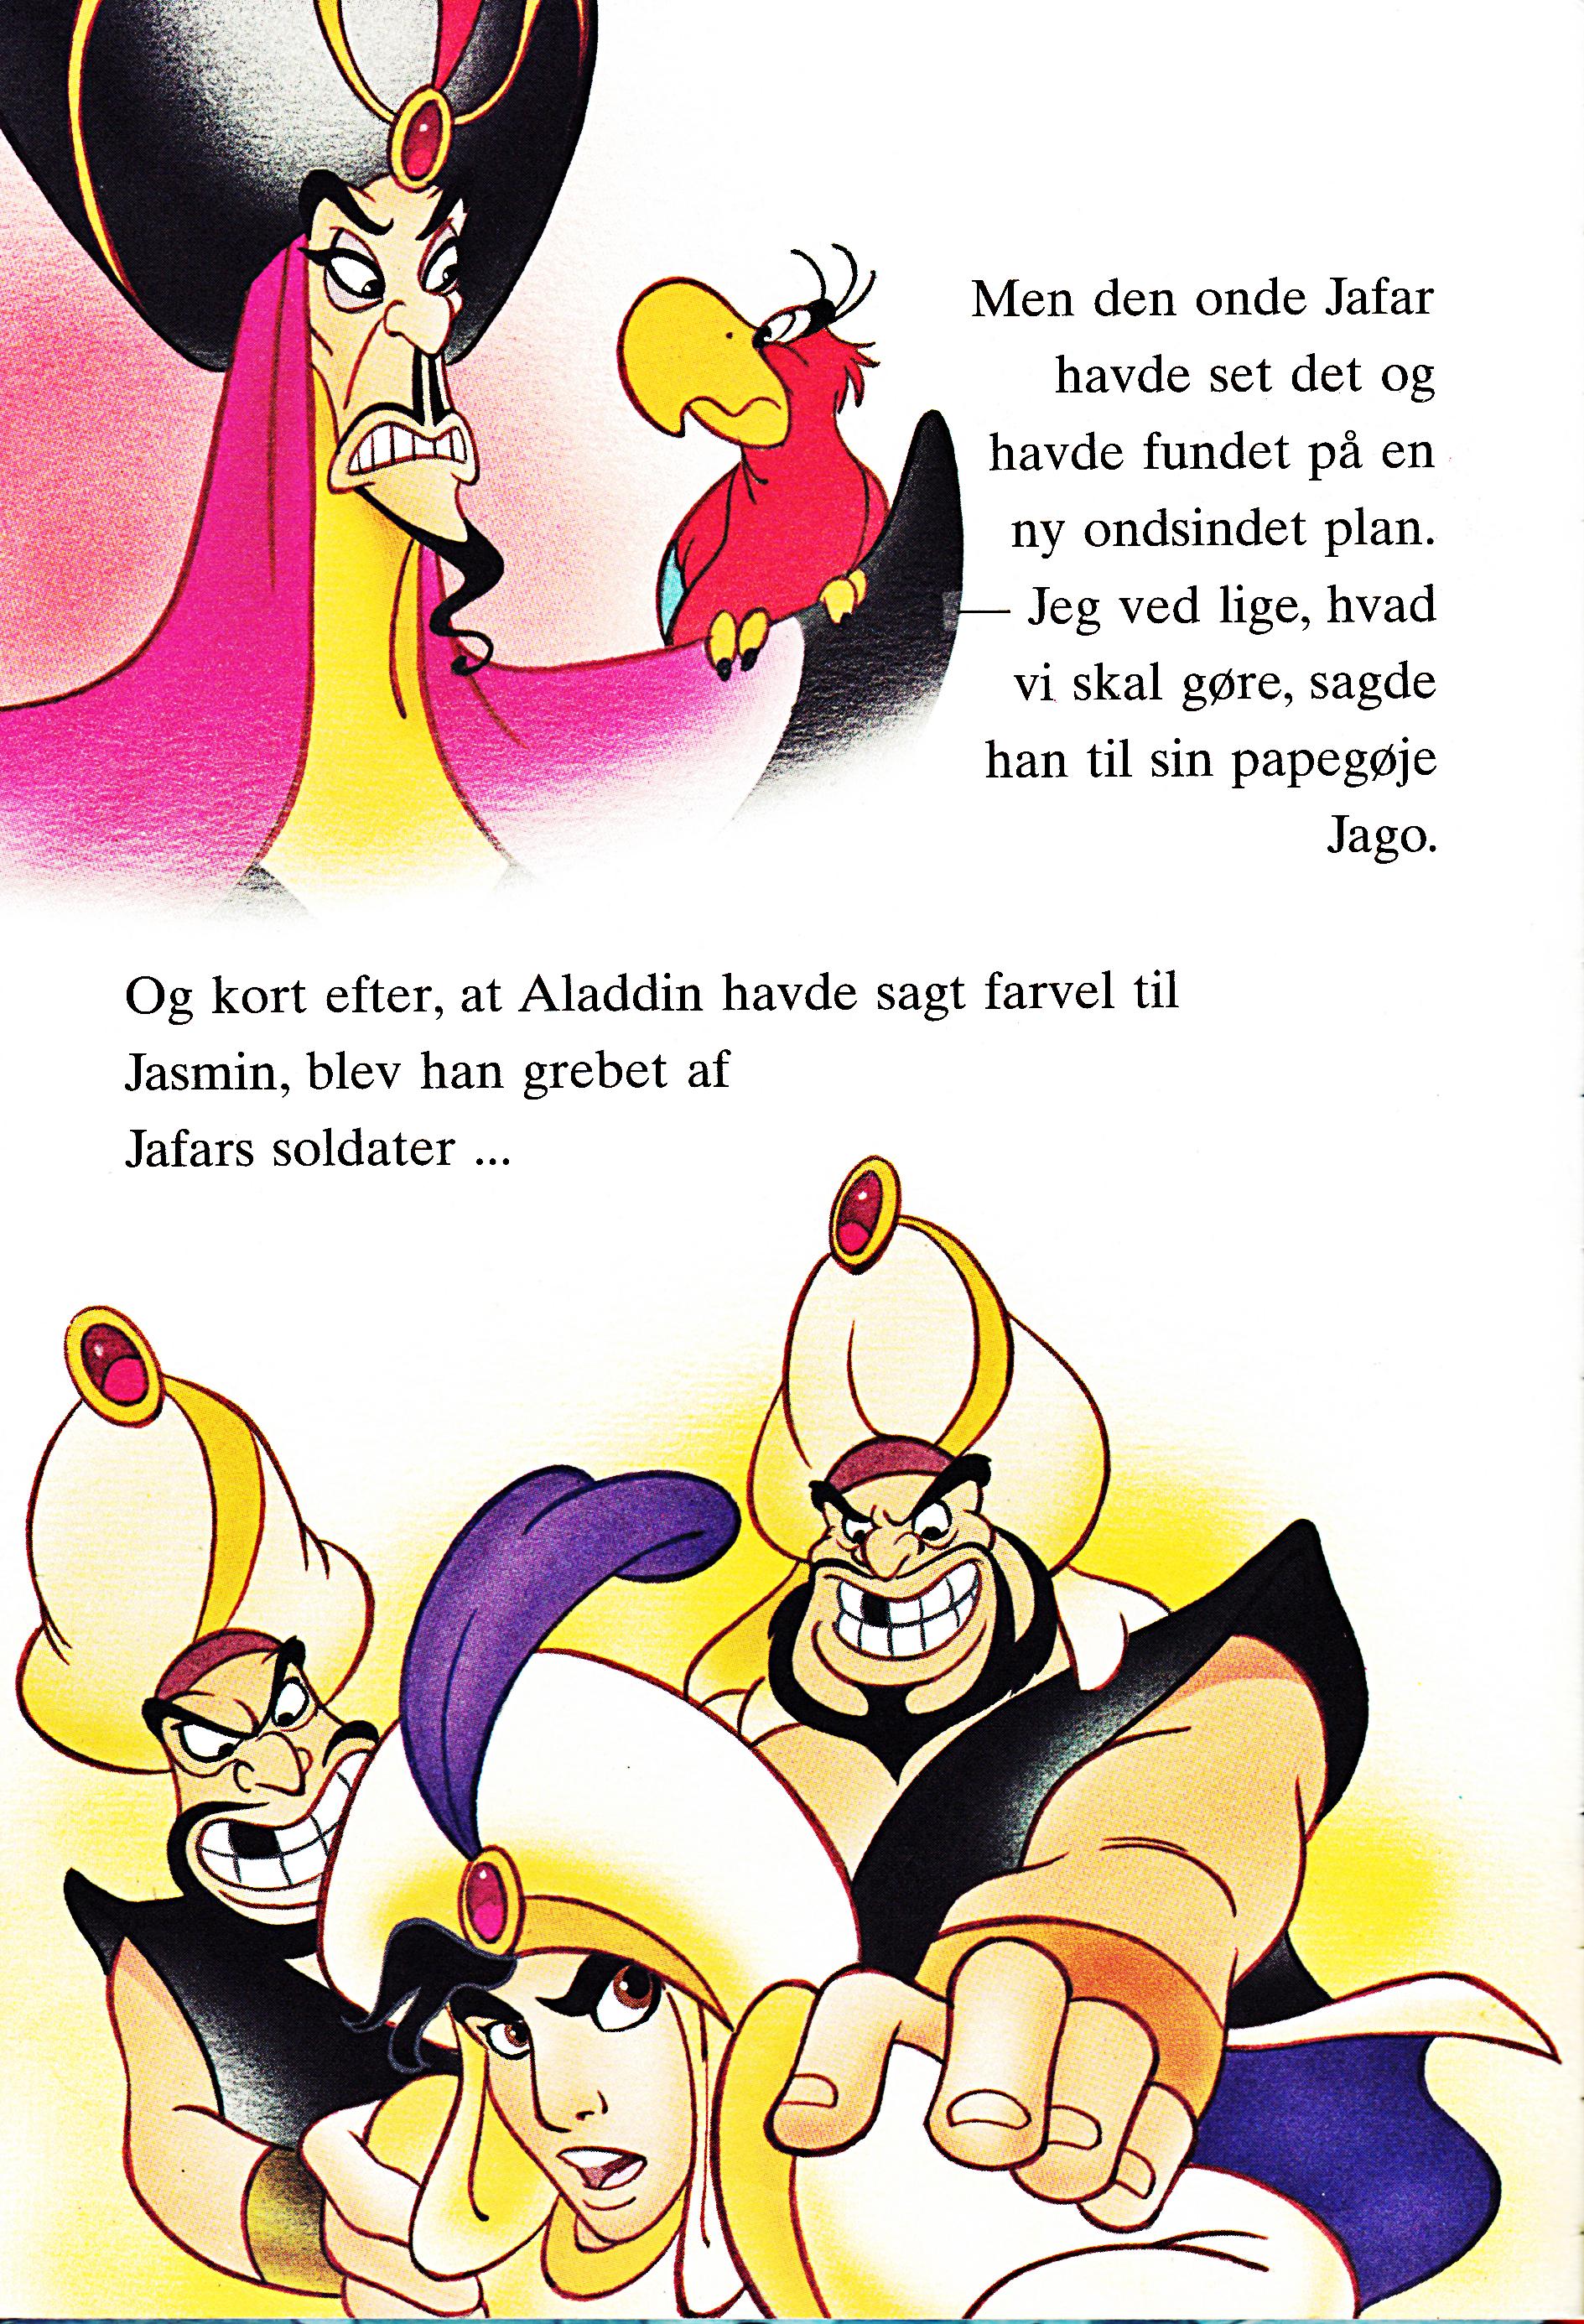 Walt Disney Book Images - Jafar, Iago, Prince Aladdin & Razoul